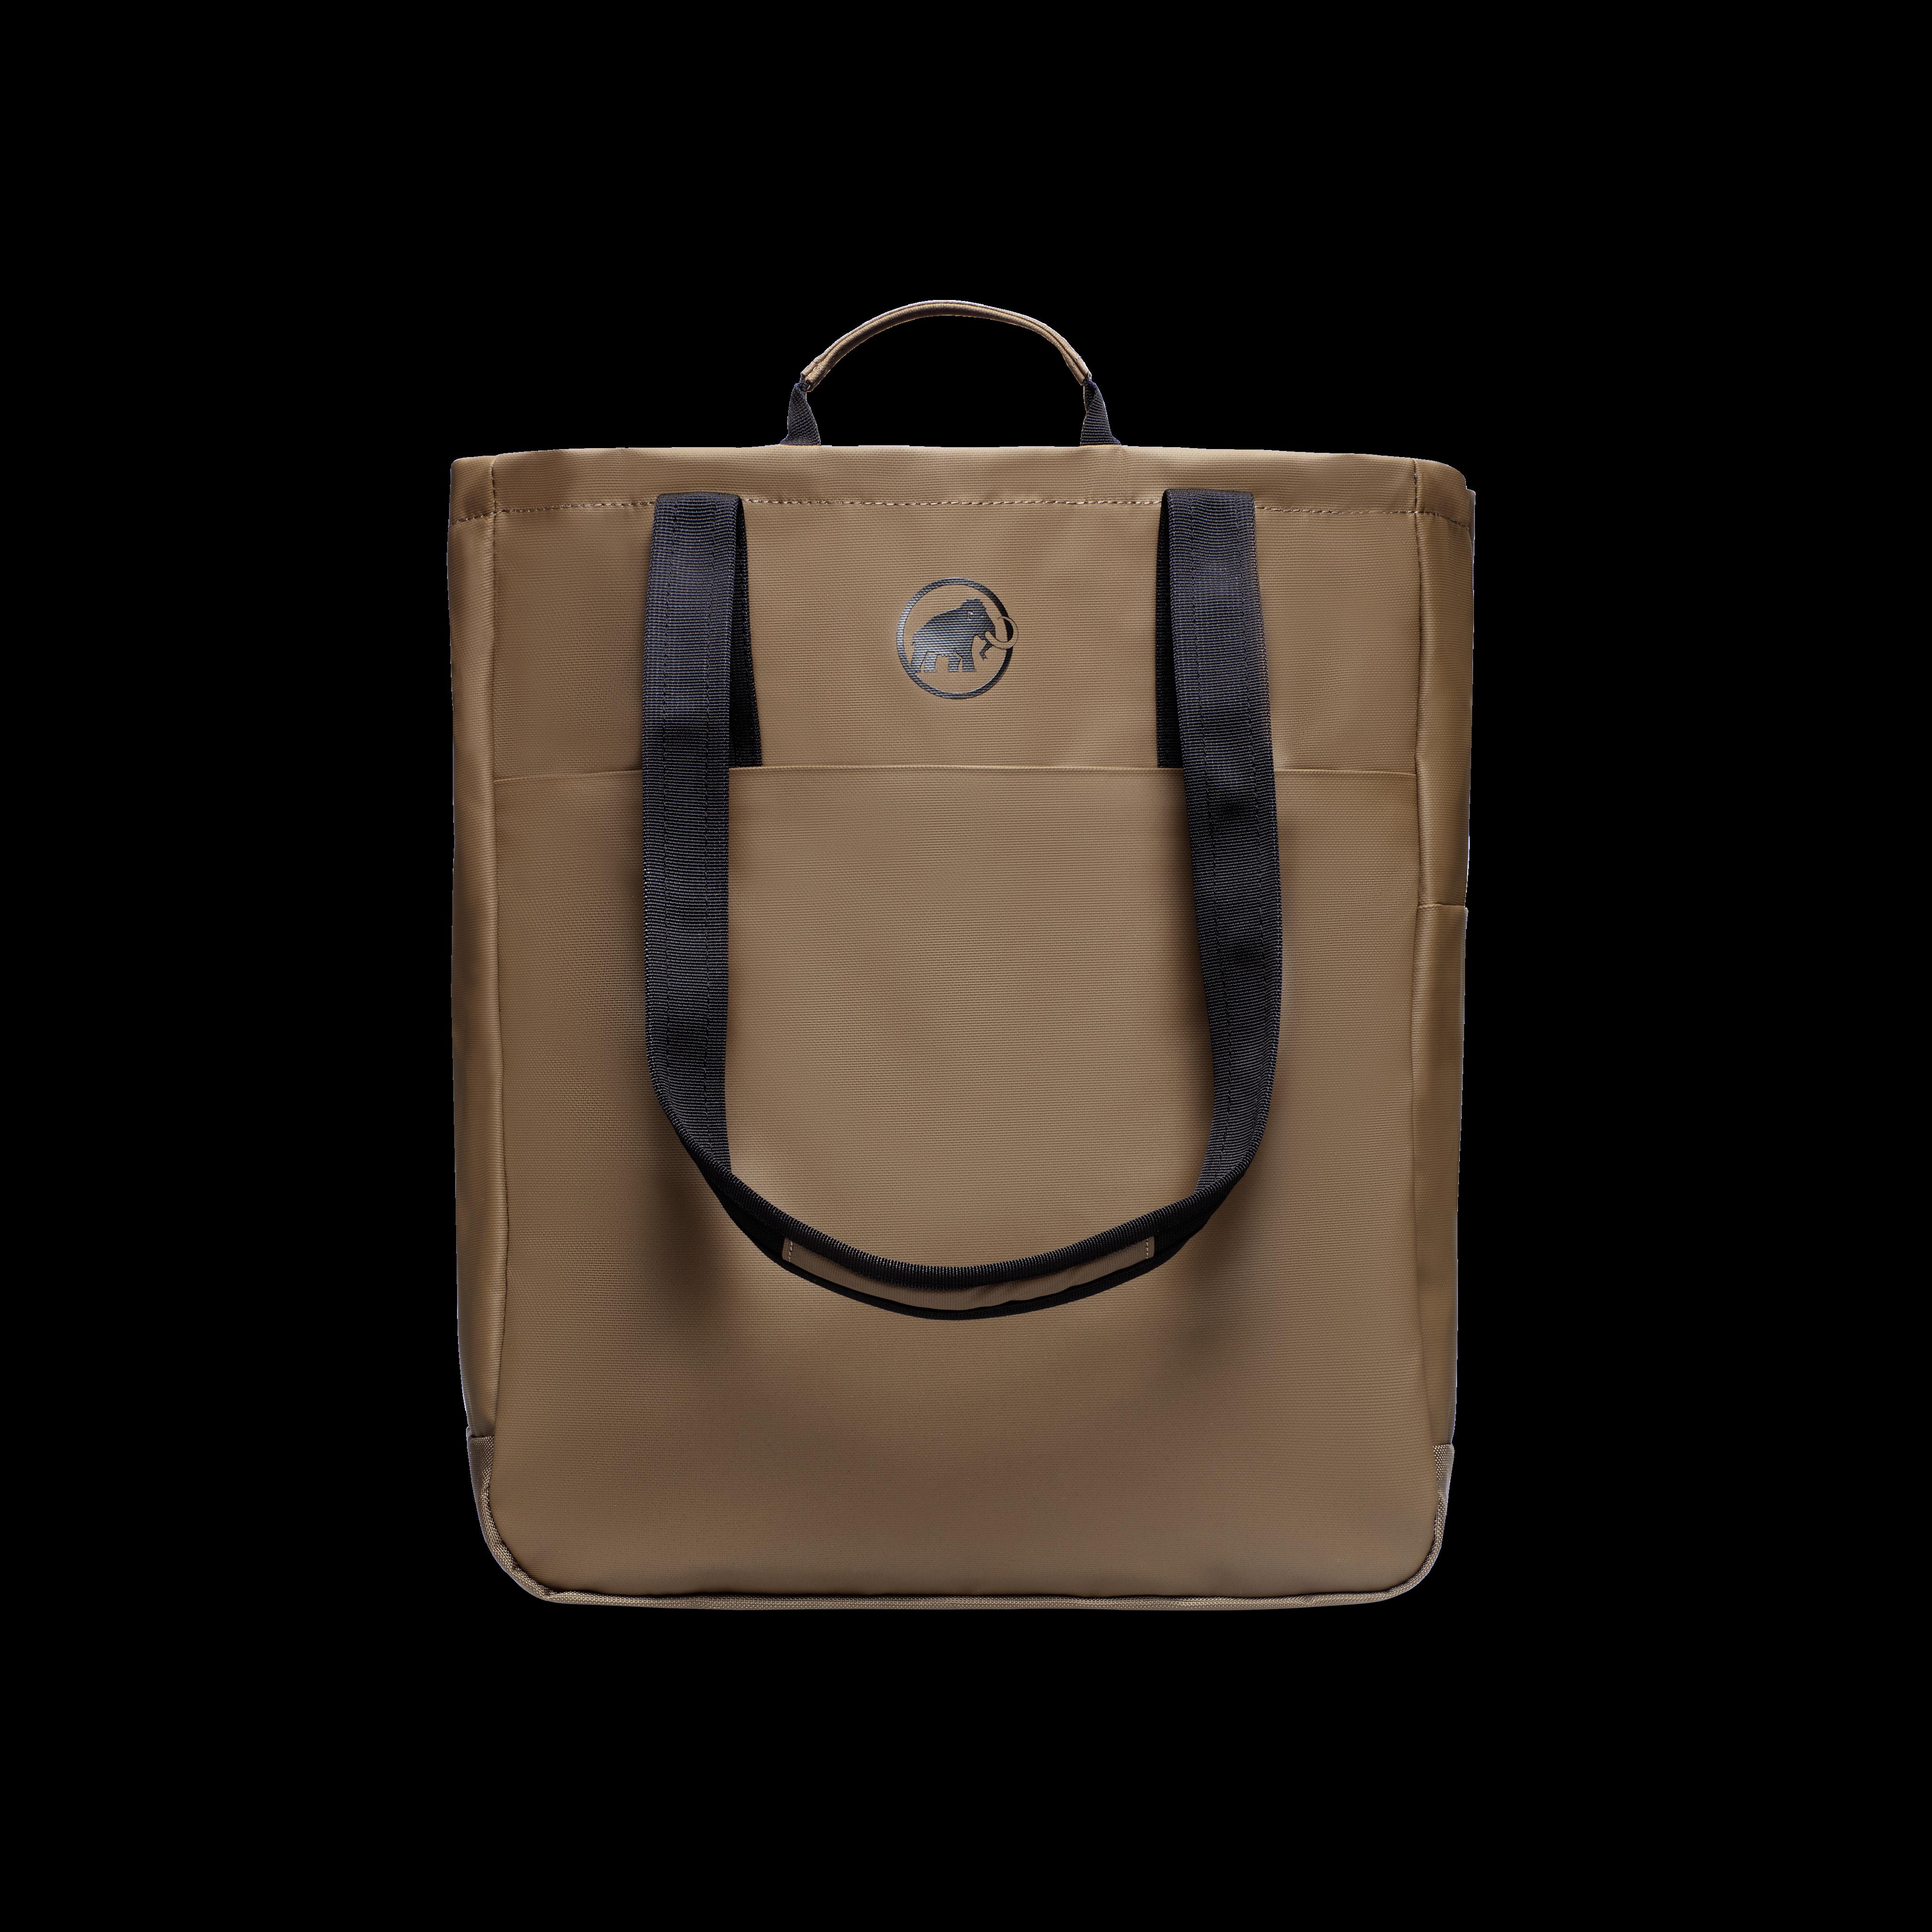 Seon Tote Bag - 15 L, dark clay thumbnail